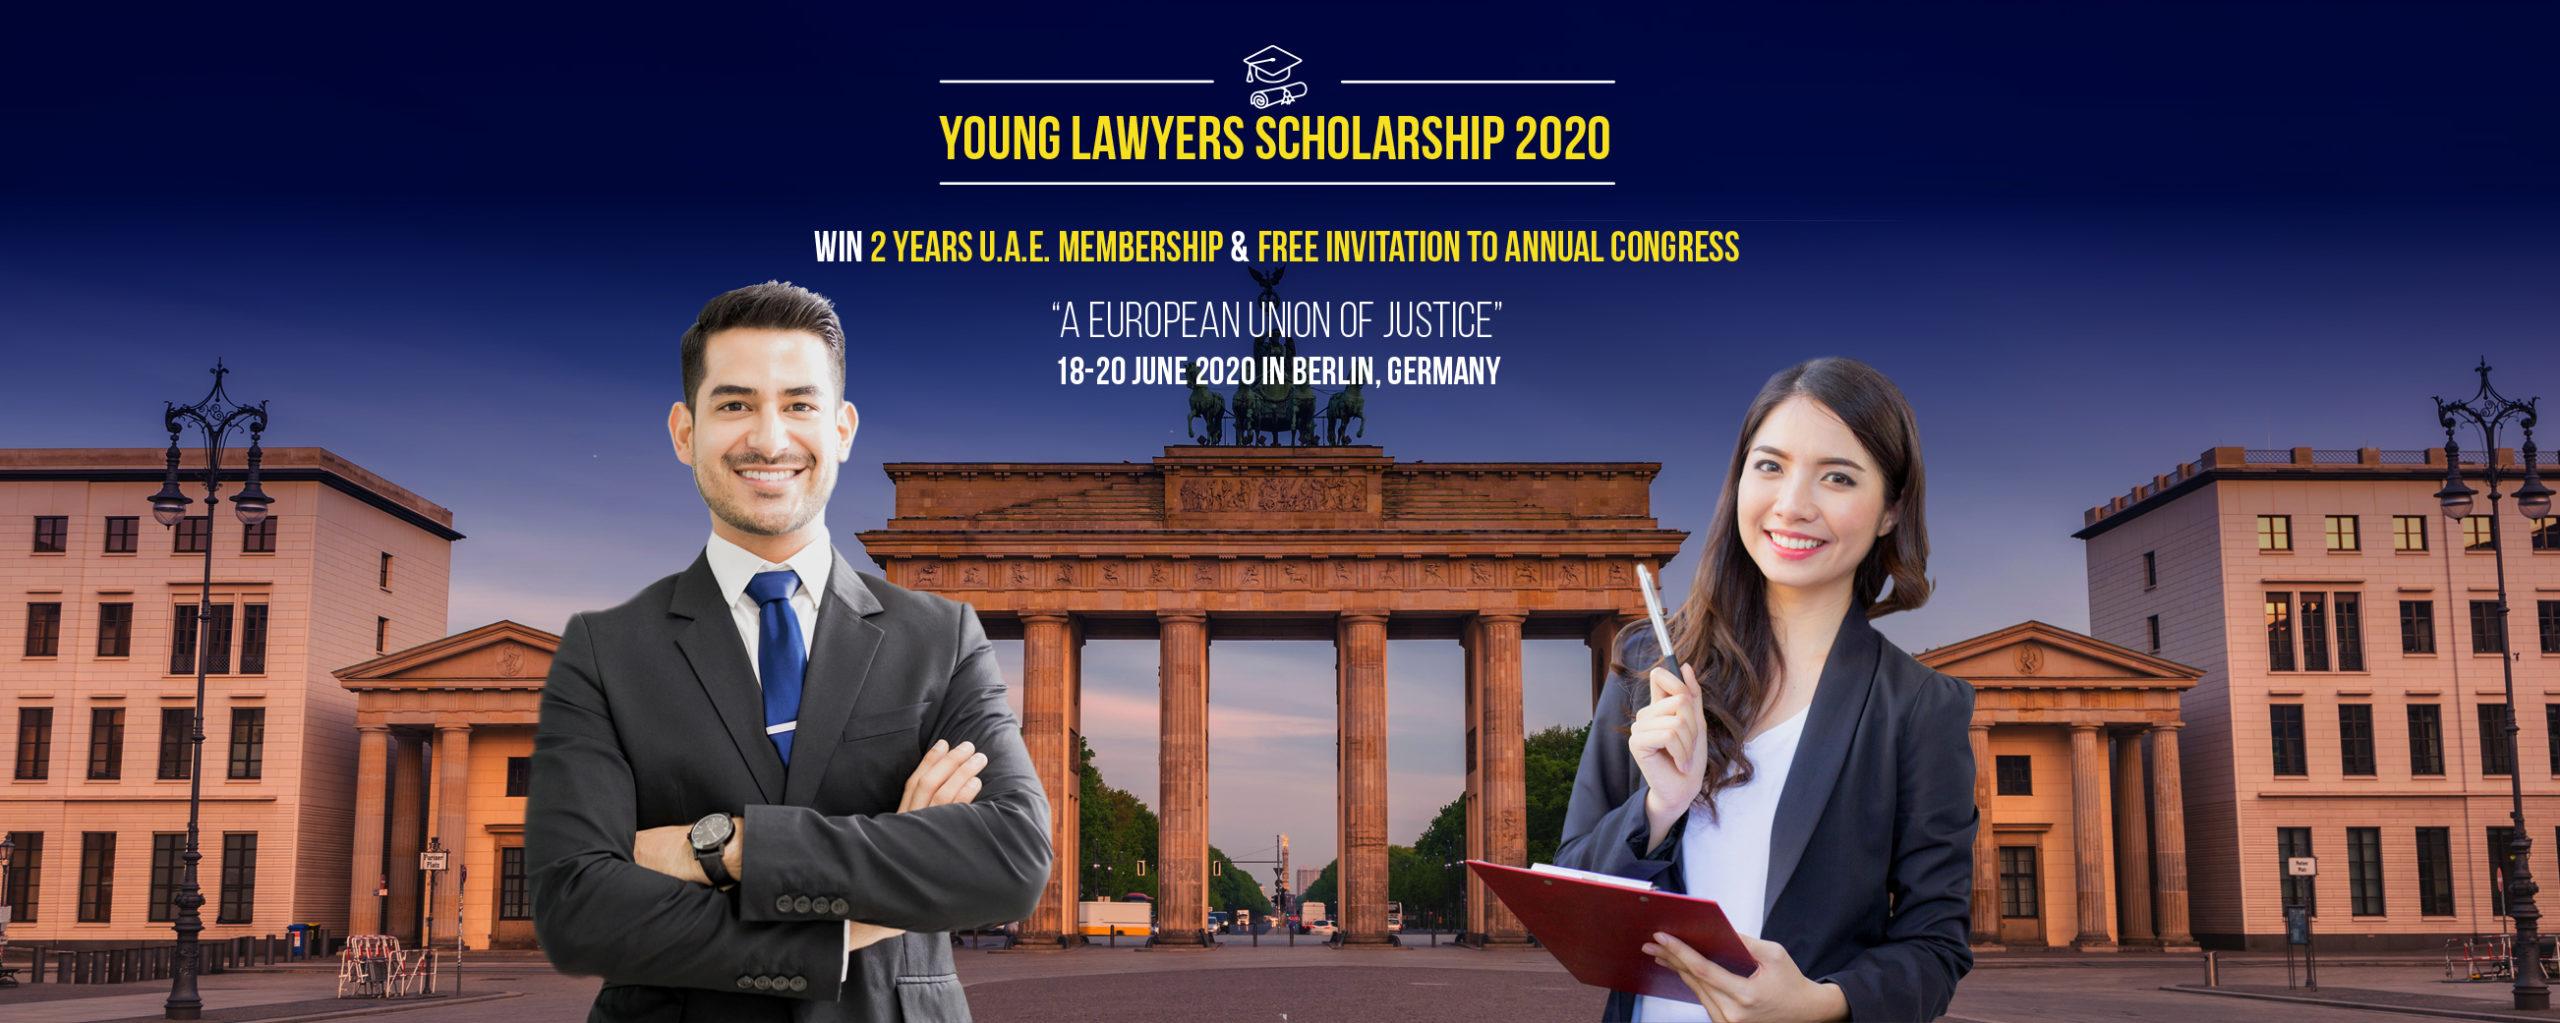 Scholarship 2020 (U.A.E.)